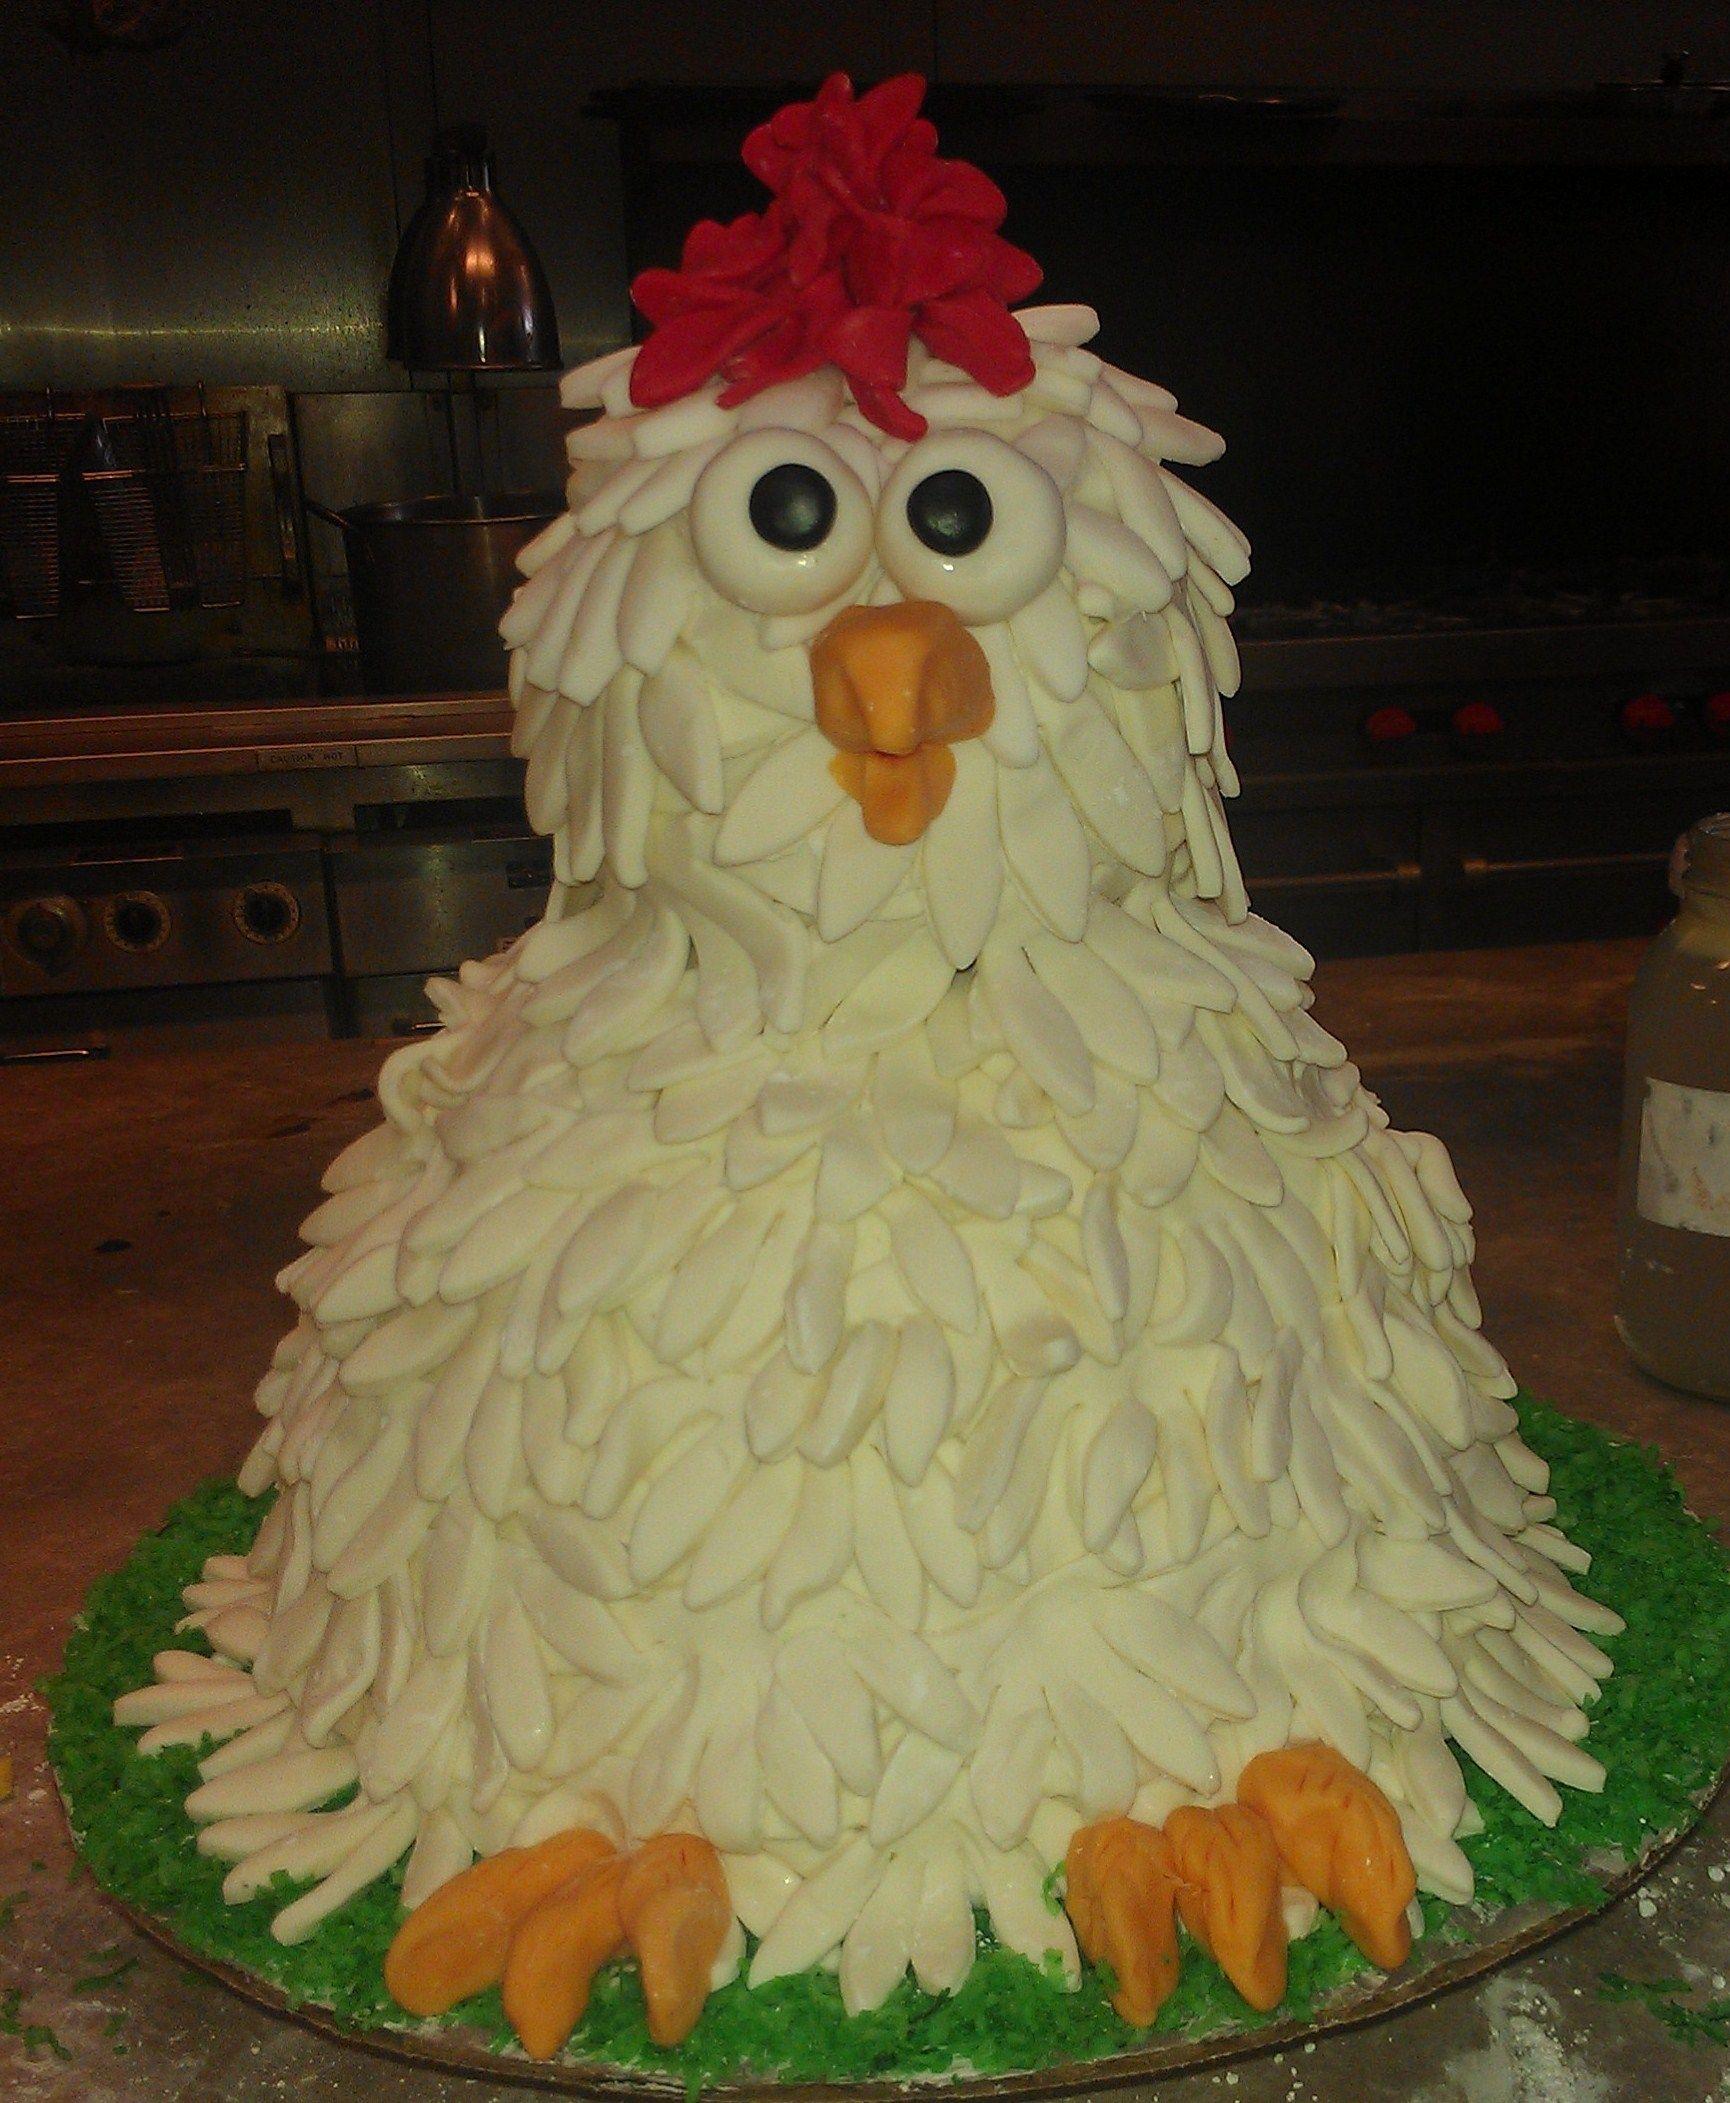 Fantastic Chicken Cake By The Yellow Carrot Chicken Cake My Birthday Cake Funny Birthday Cards Online Bapapcheapnameinfo